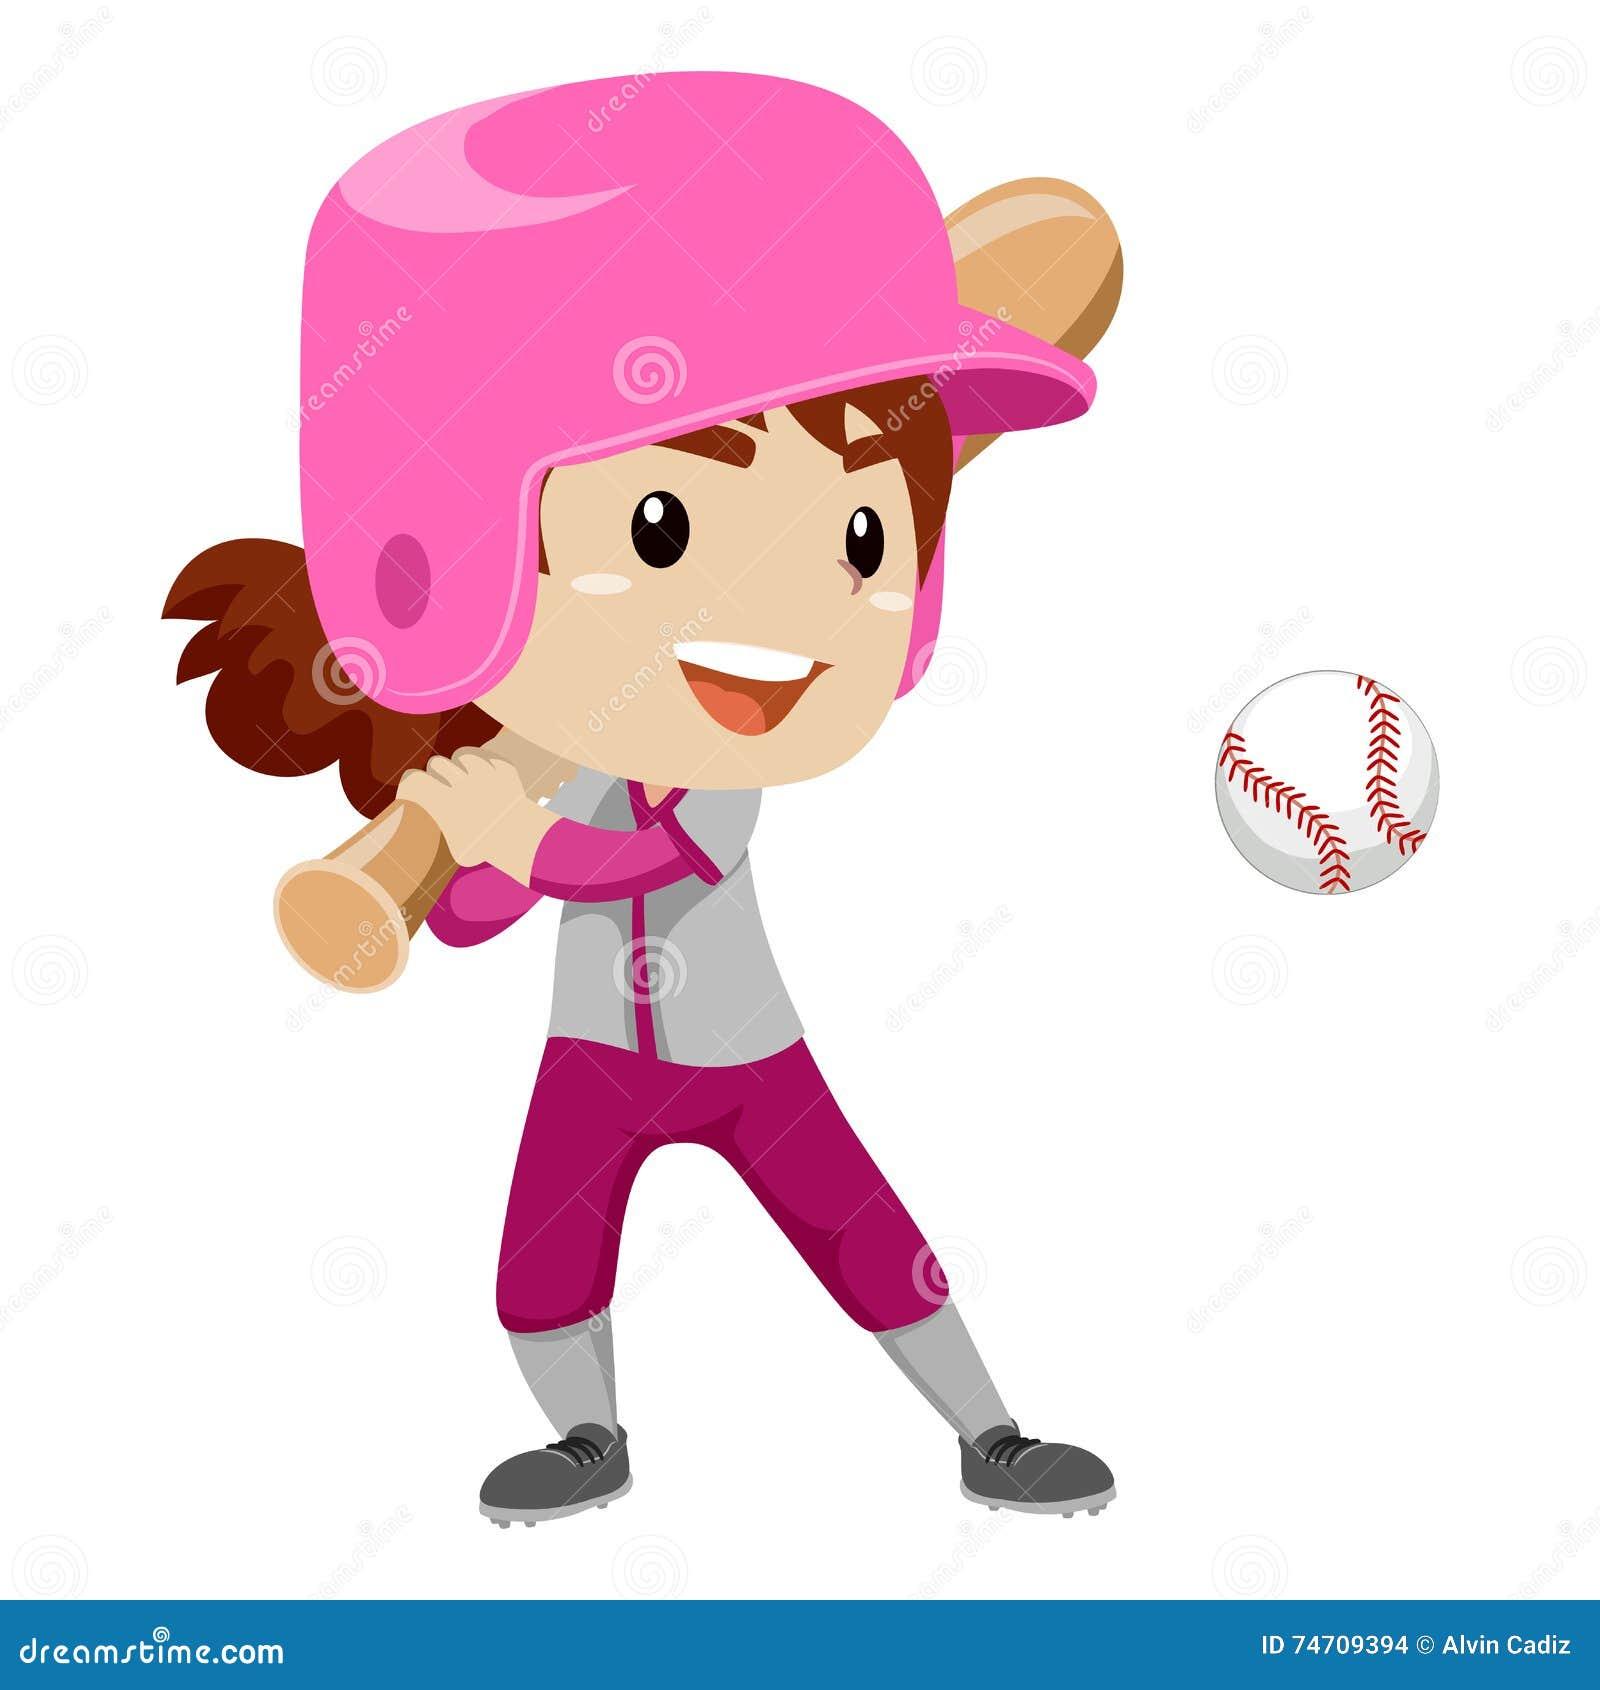 kid girl baseball player strike a ball stock vector baseball player clipart free basketball player clipart